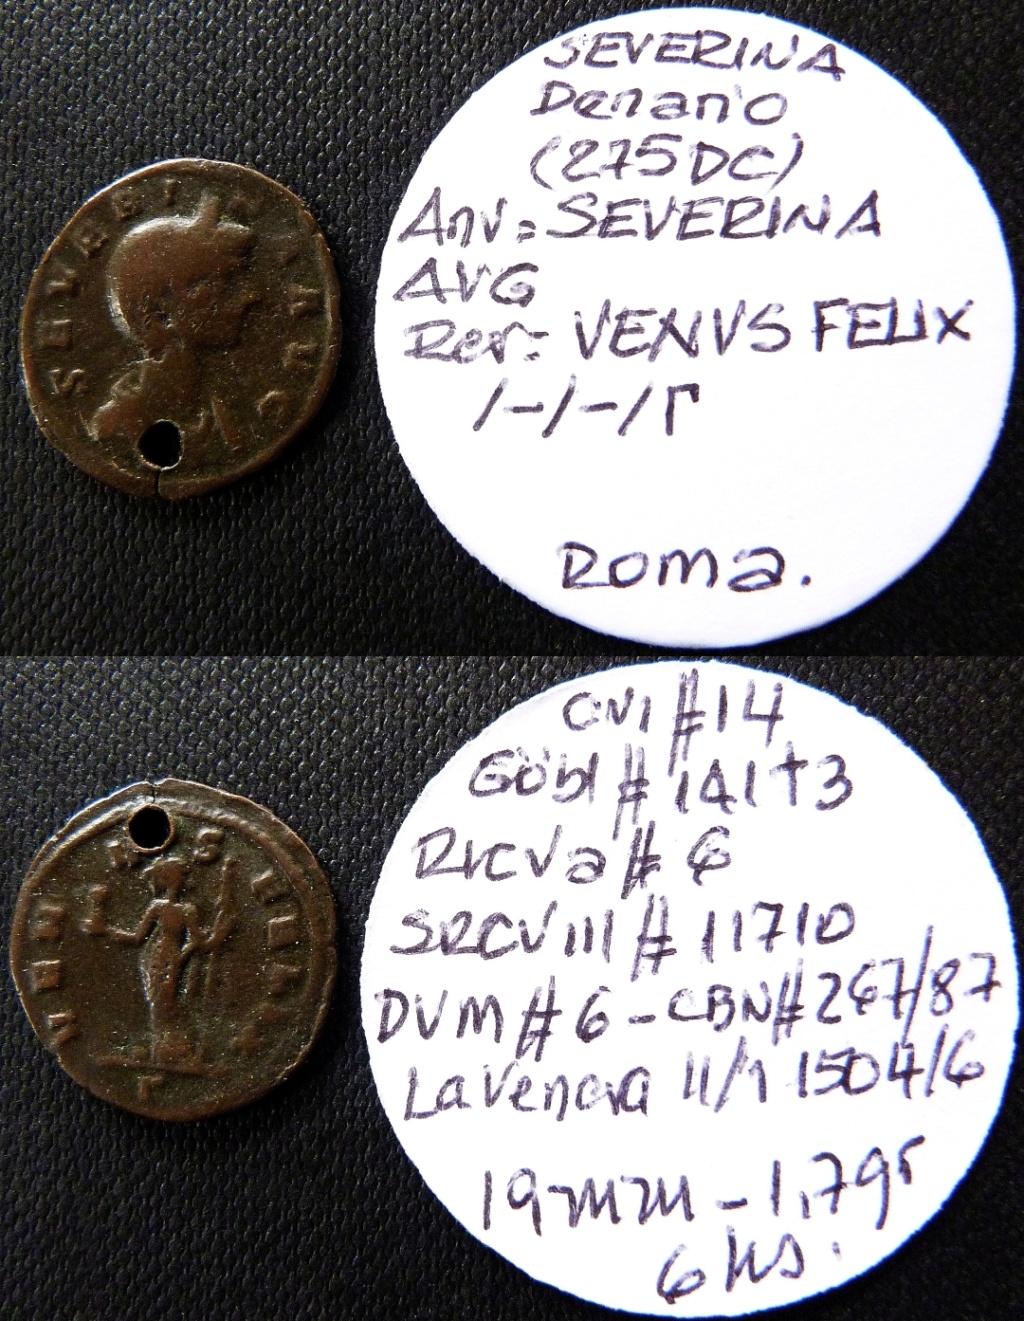 Denario de Severina. VENVS FELIX. Roma 3ª oficina Ric_6_10